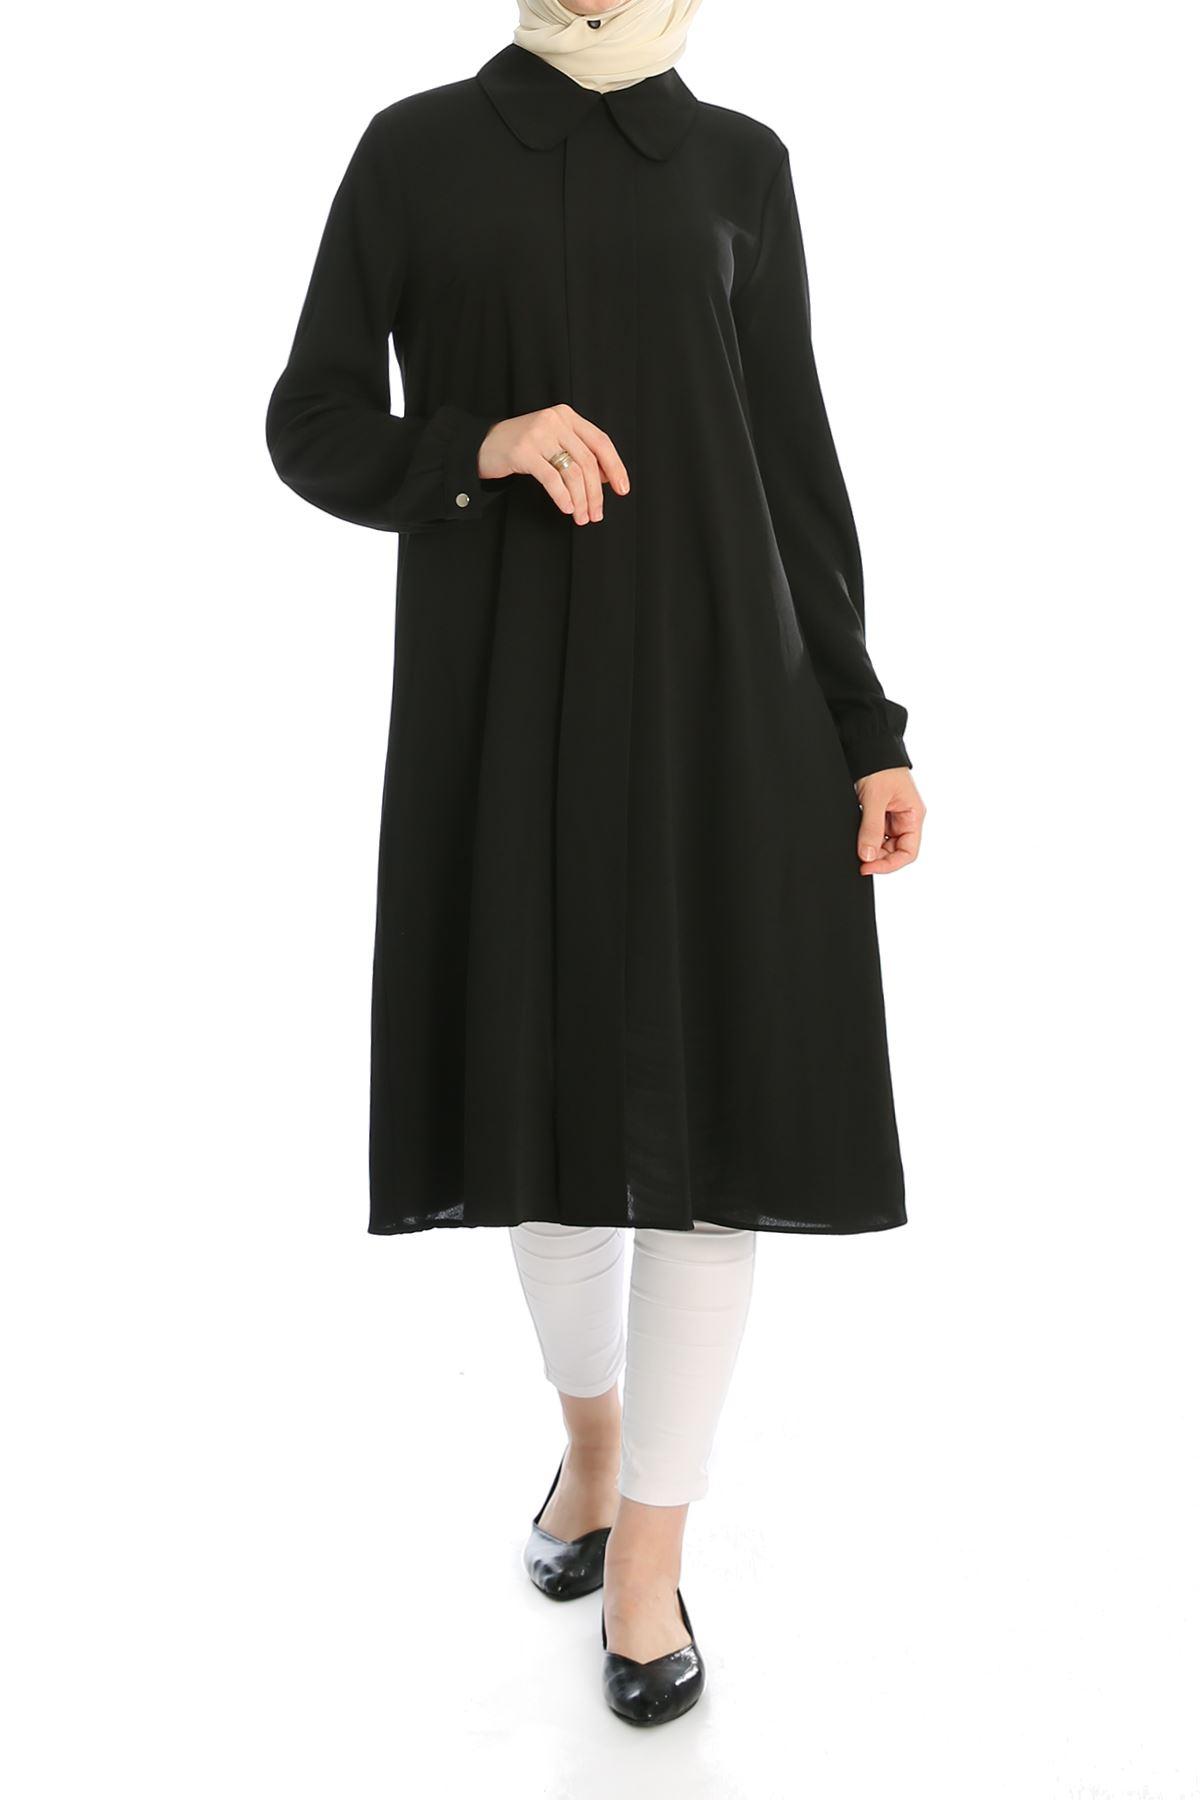 Ön Şerit Detay Tunik-Siyah